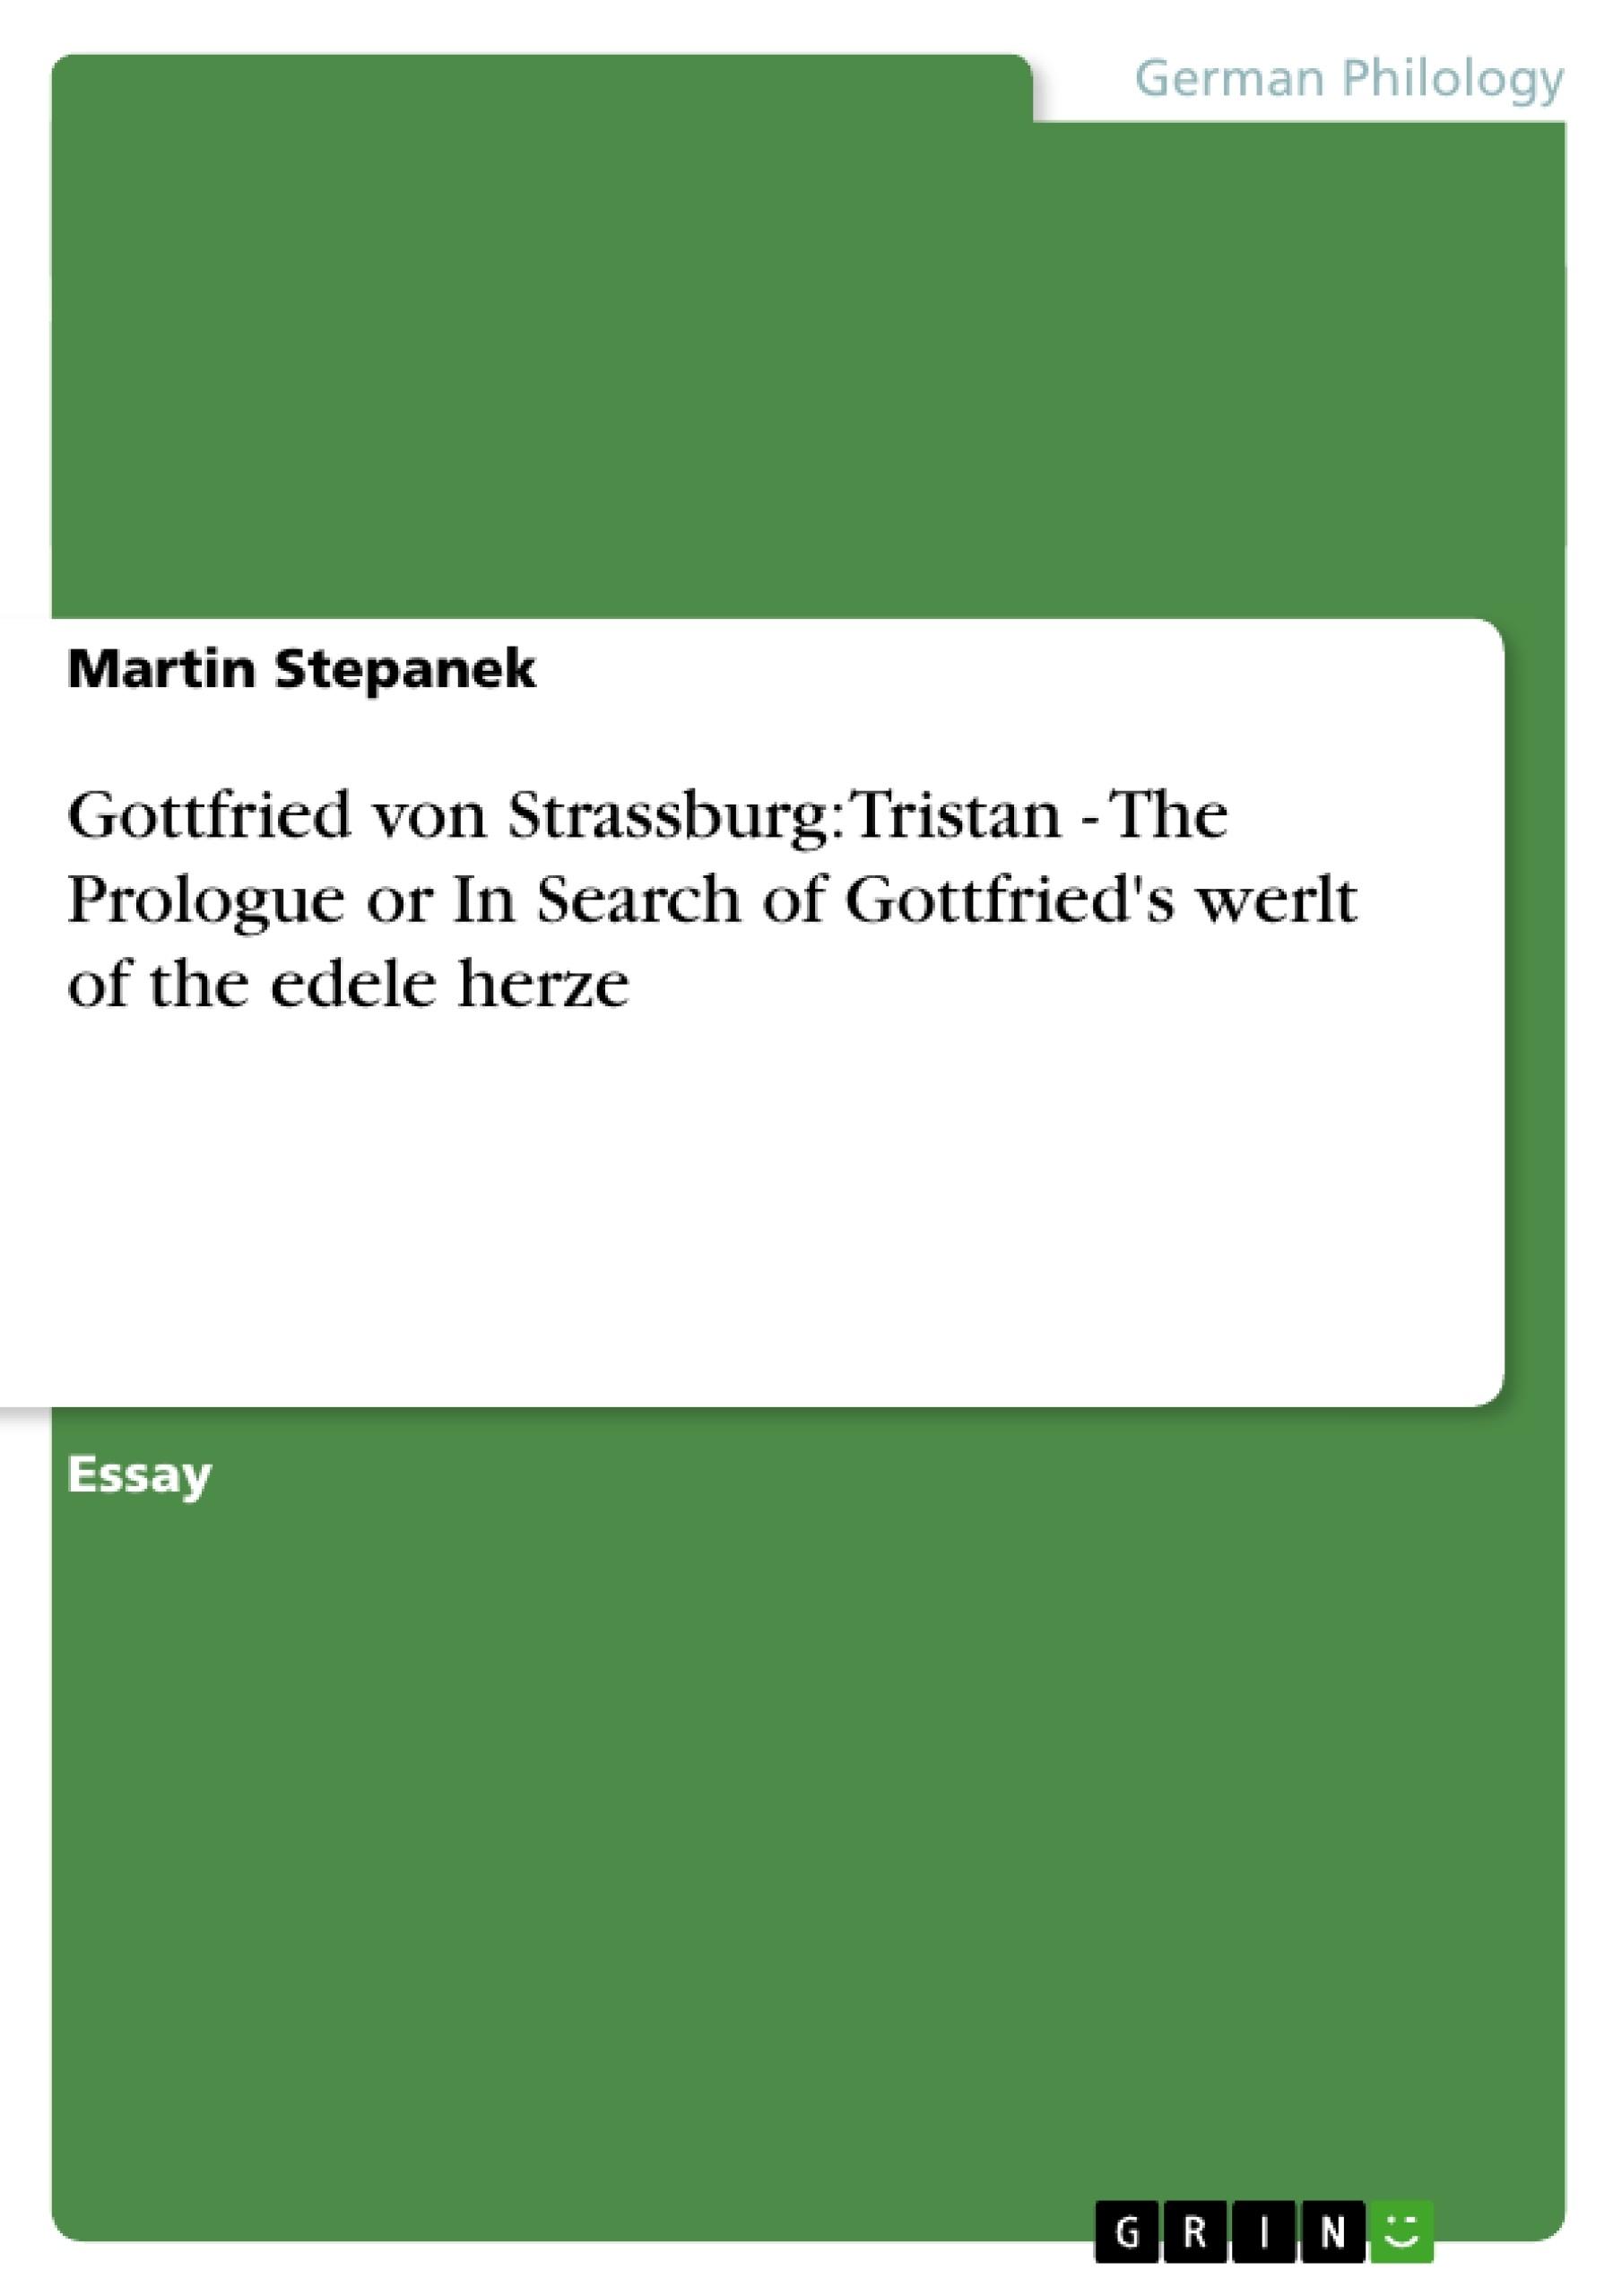 Title: Gottfried von Strassburg: Tristan - The Prologue or In Search of Gottfried's werlt of the edele herze